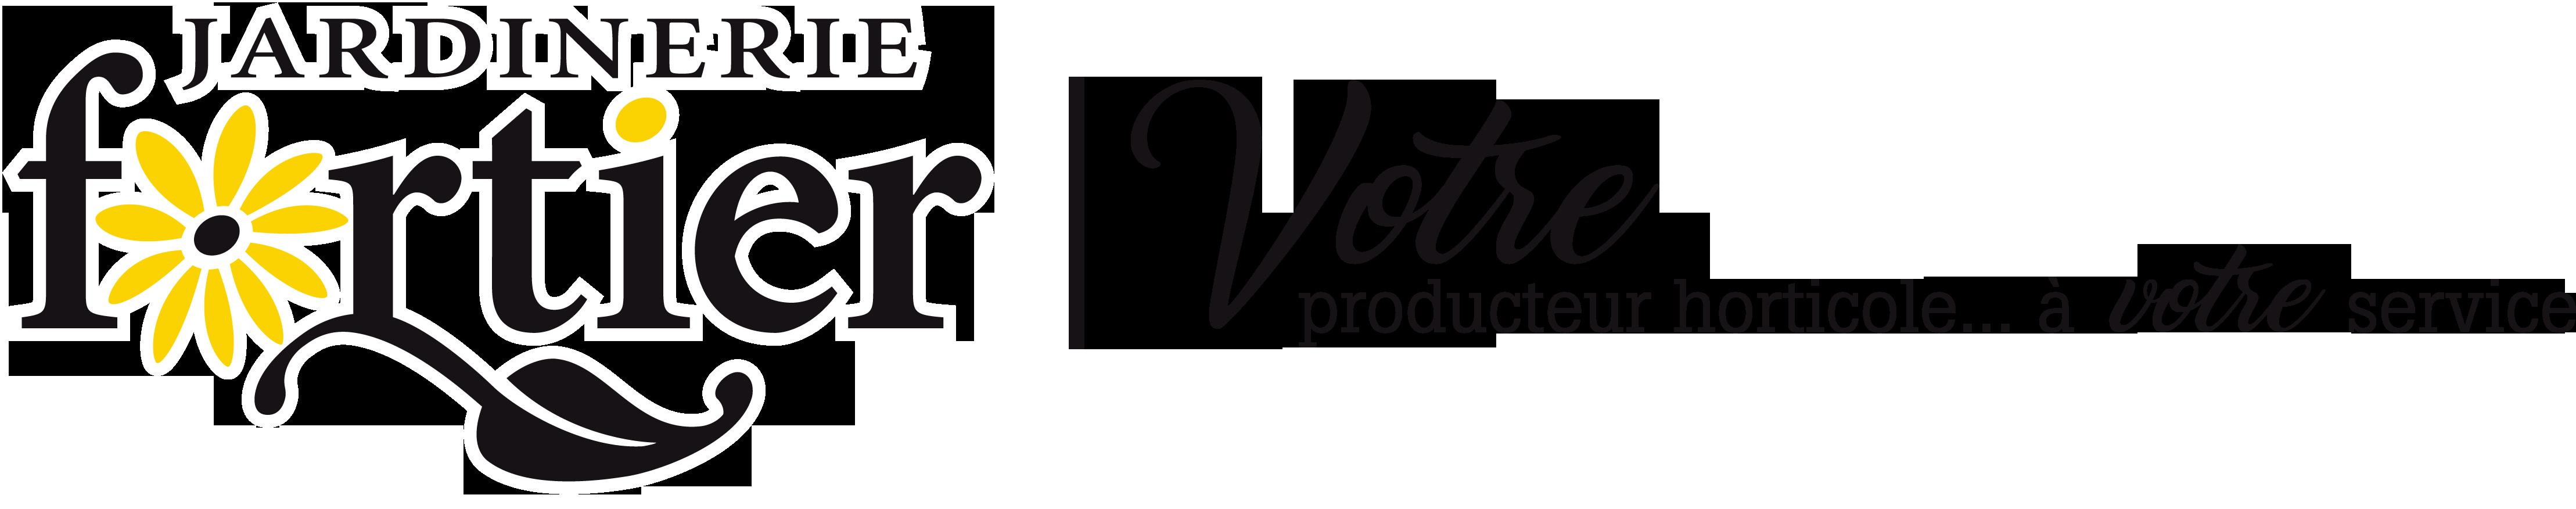 Logo Jardinerie Fortier